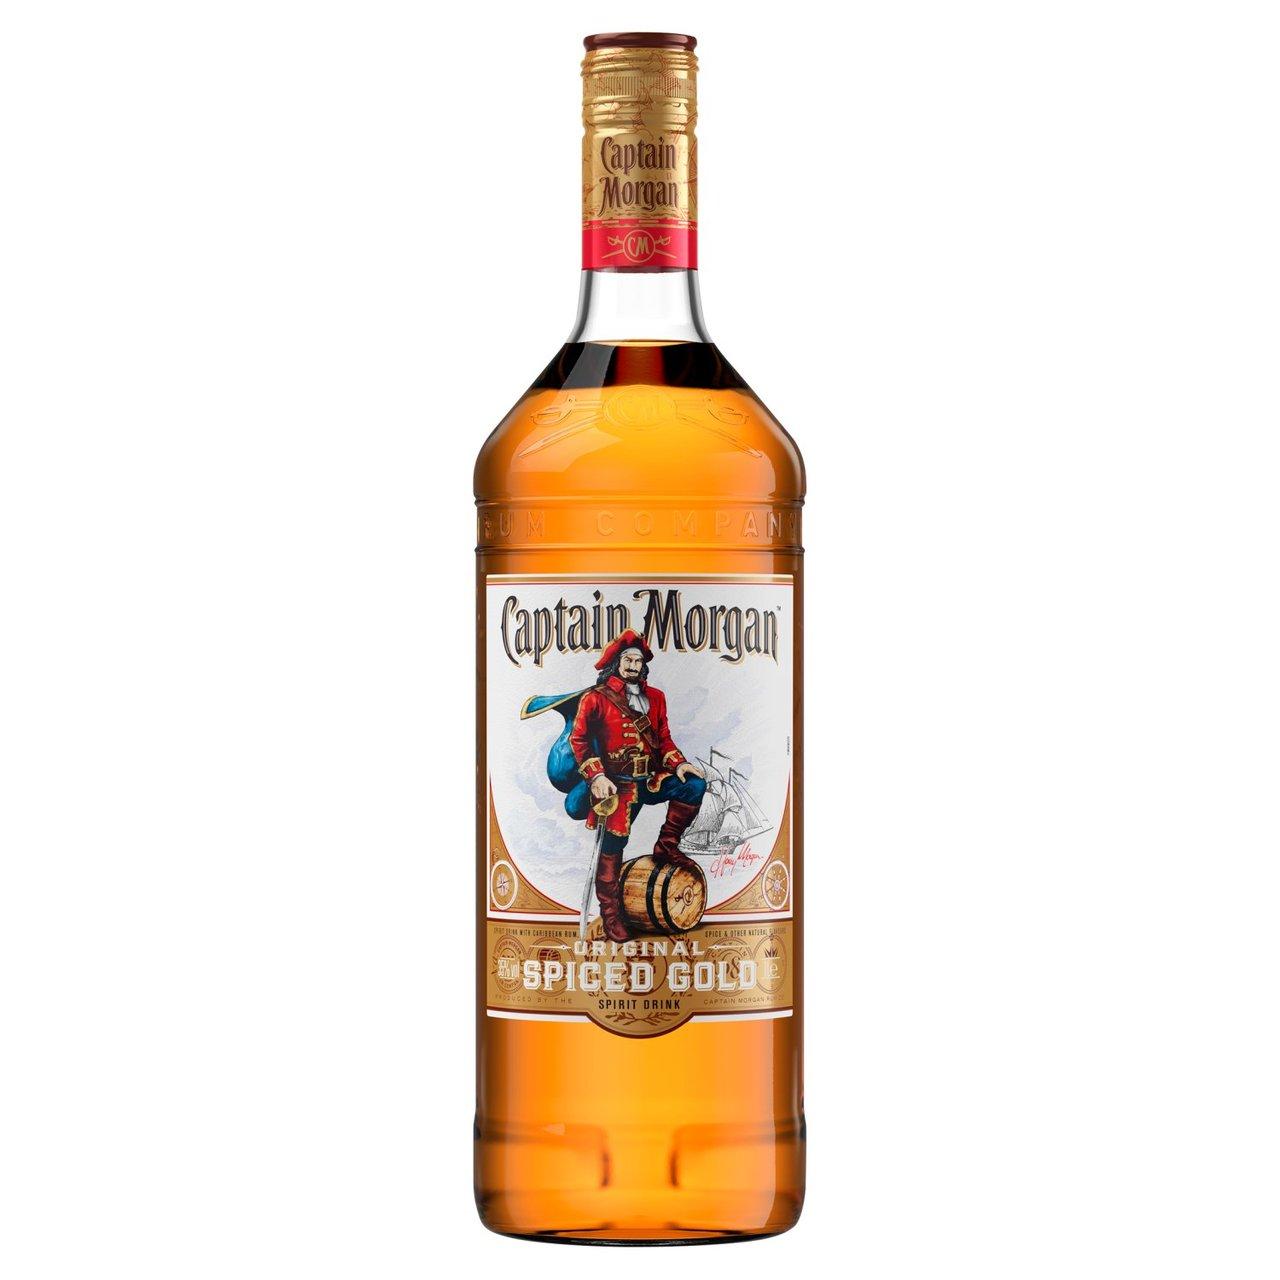 Captain Morgan Original Spiced Gold Rum 1 Litre £15.99 @ Morrisons